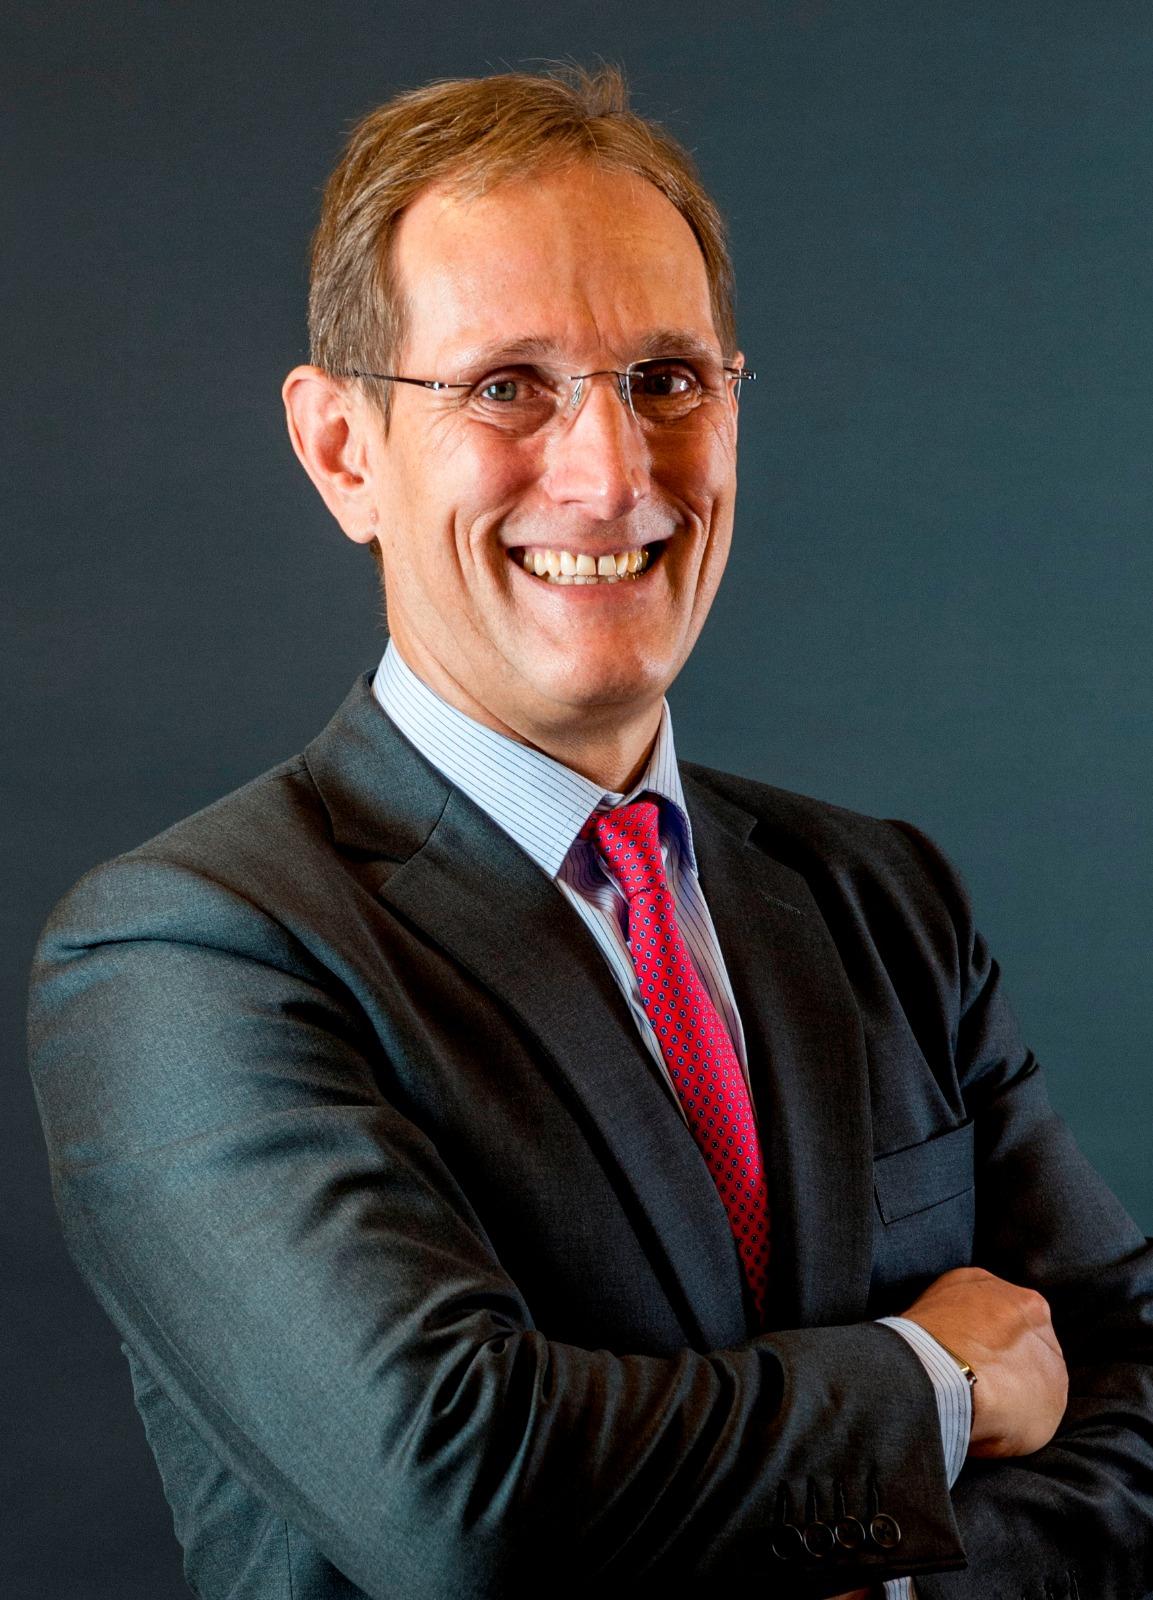 Prof. Jochen Wirtz